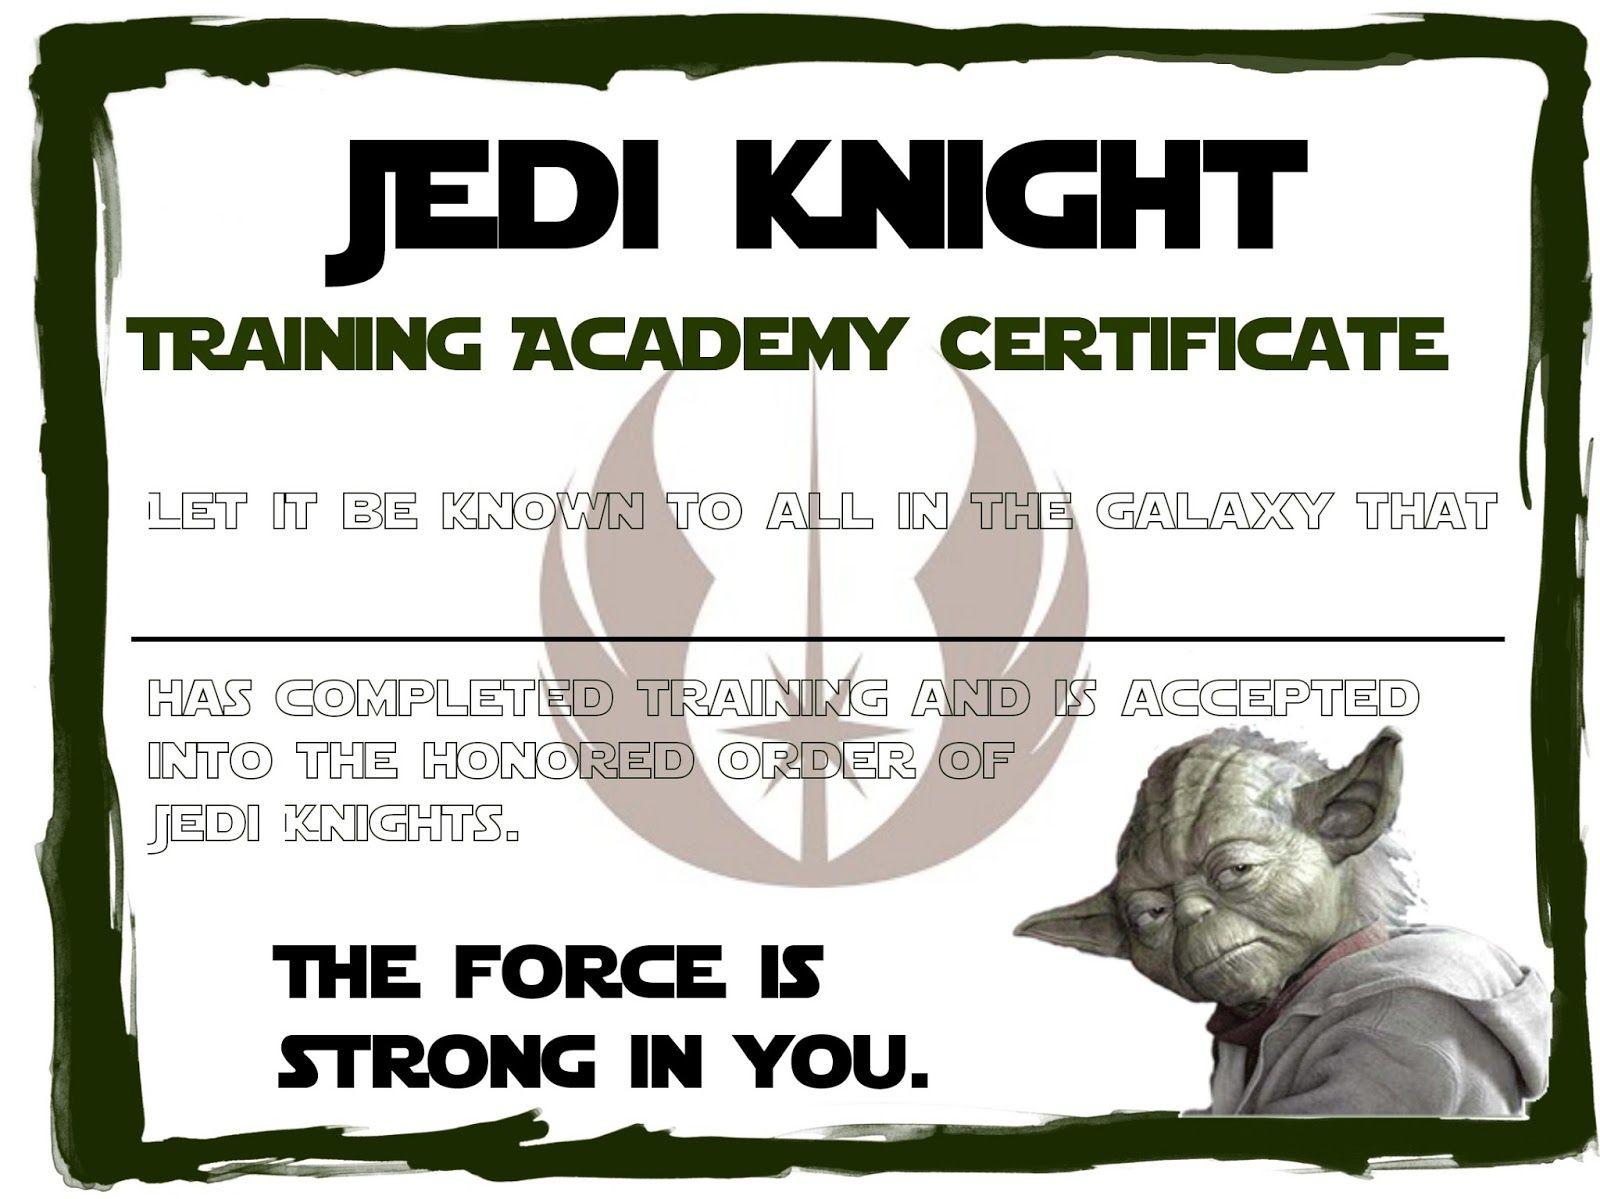 jedi training academy graduation certificate printable star wars 24974d35c2cf141ad2f3a67df8205fa5 523402787927621257 free jedi training certificate